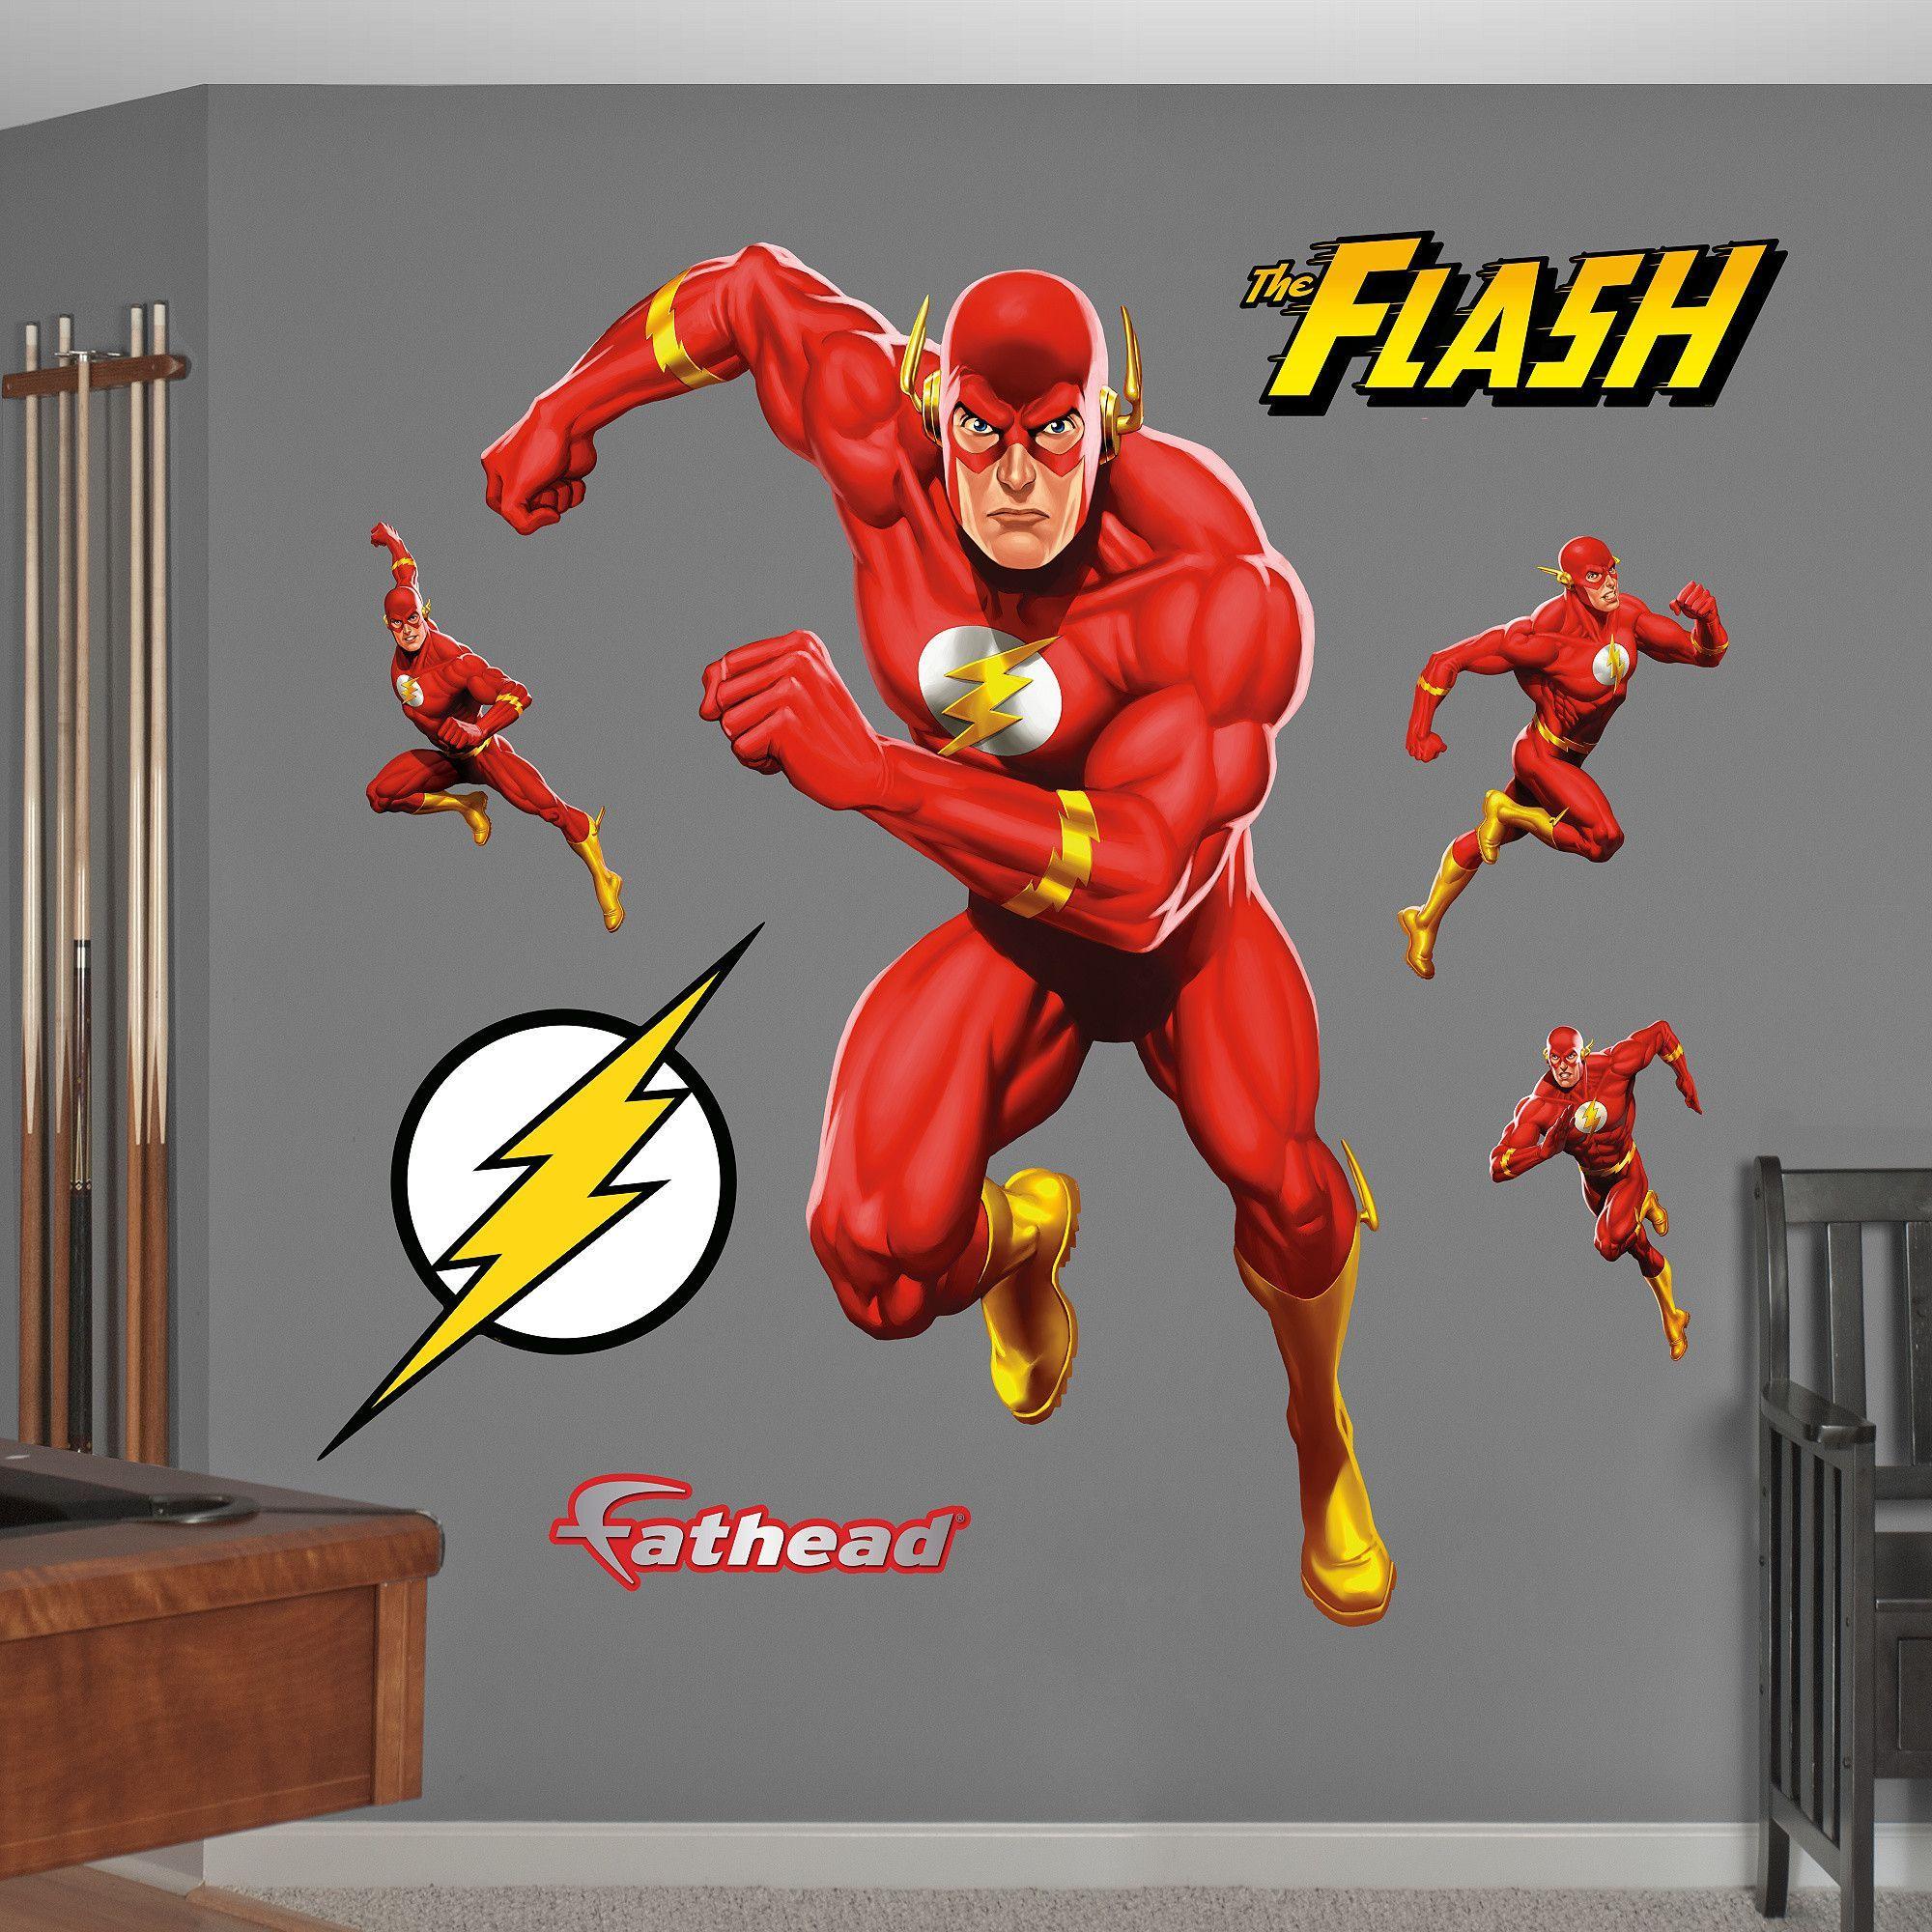 Fathead Flash Action Fathead Realbig Wall Decal Boy Room Wall Decor Superhero Wall Decals The Flash